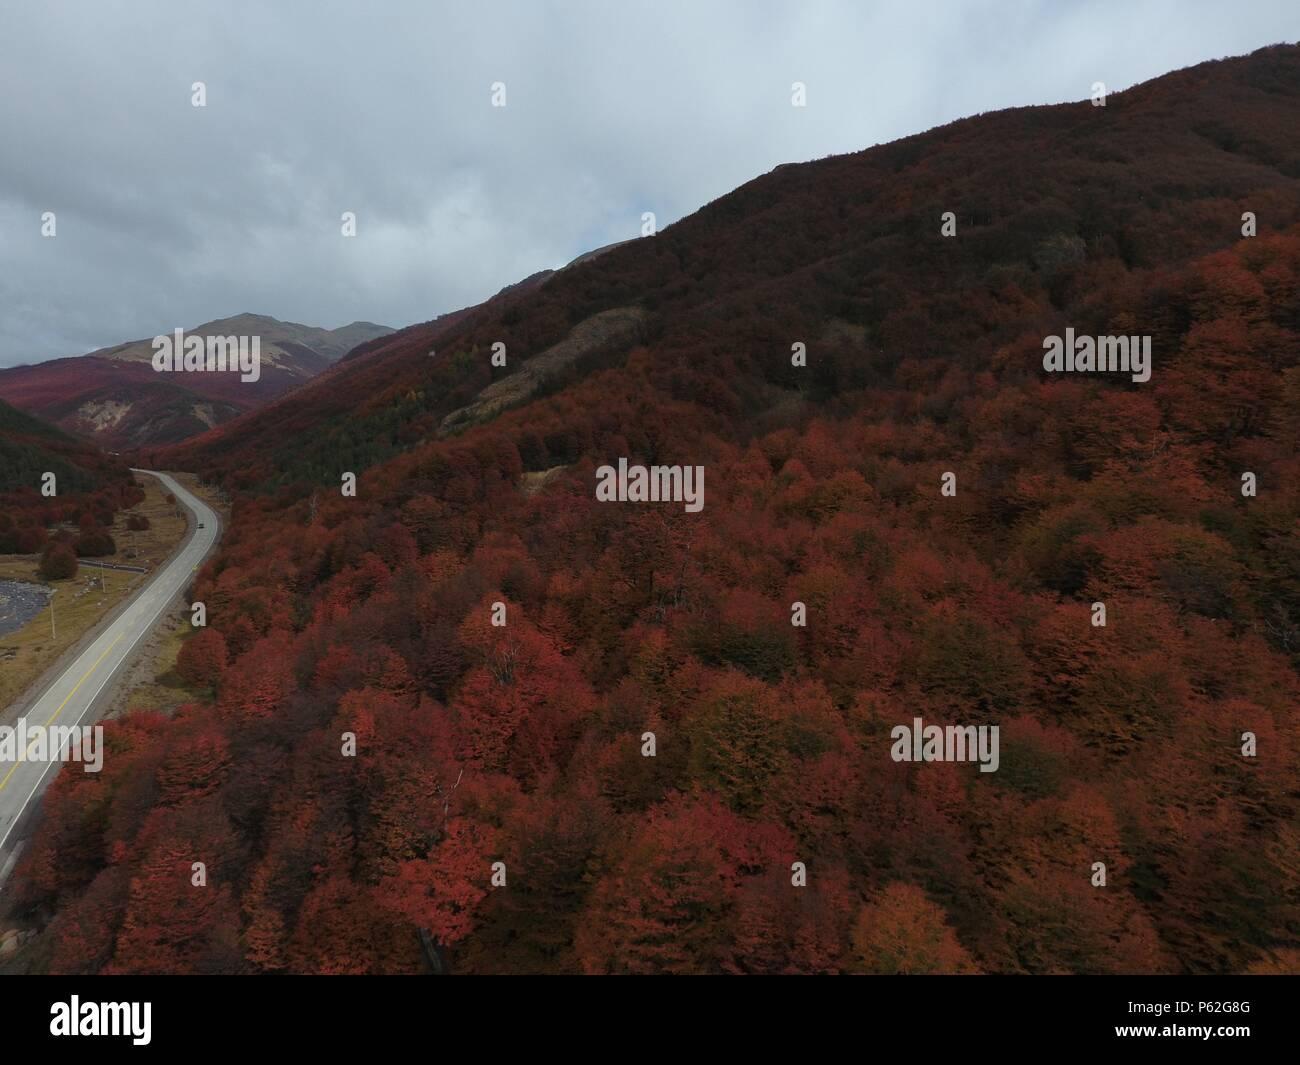 Landscapes of carretera Austral in Patagonia, Chile. Otoño en Portezuelo Ibañez - Stock Image